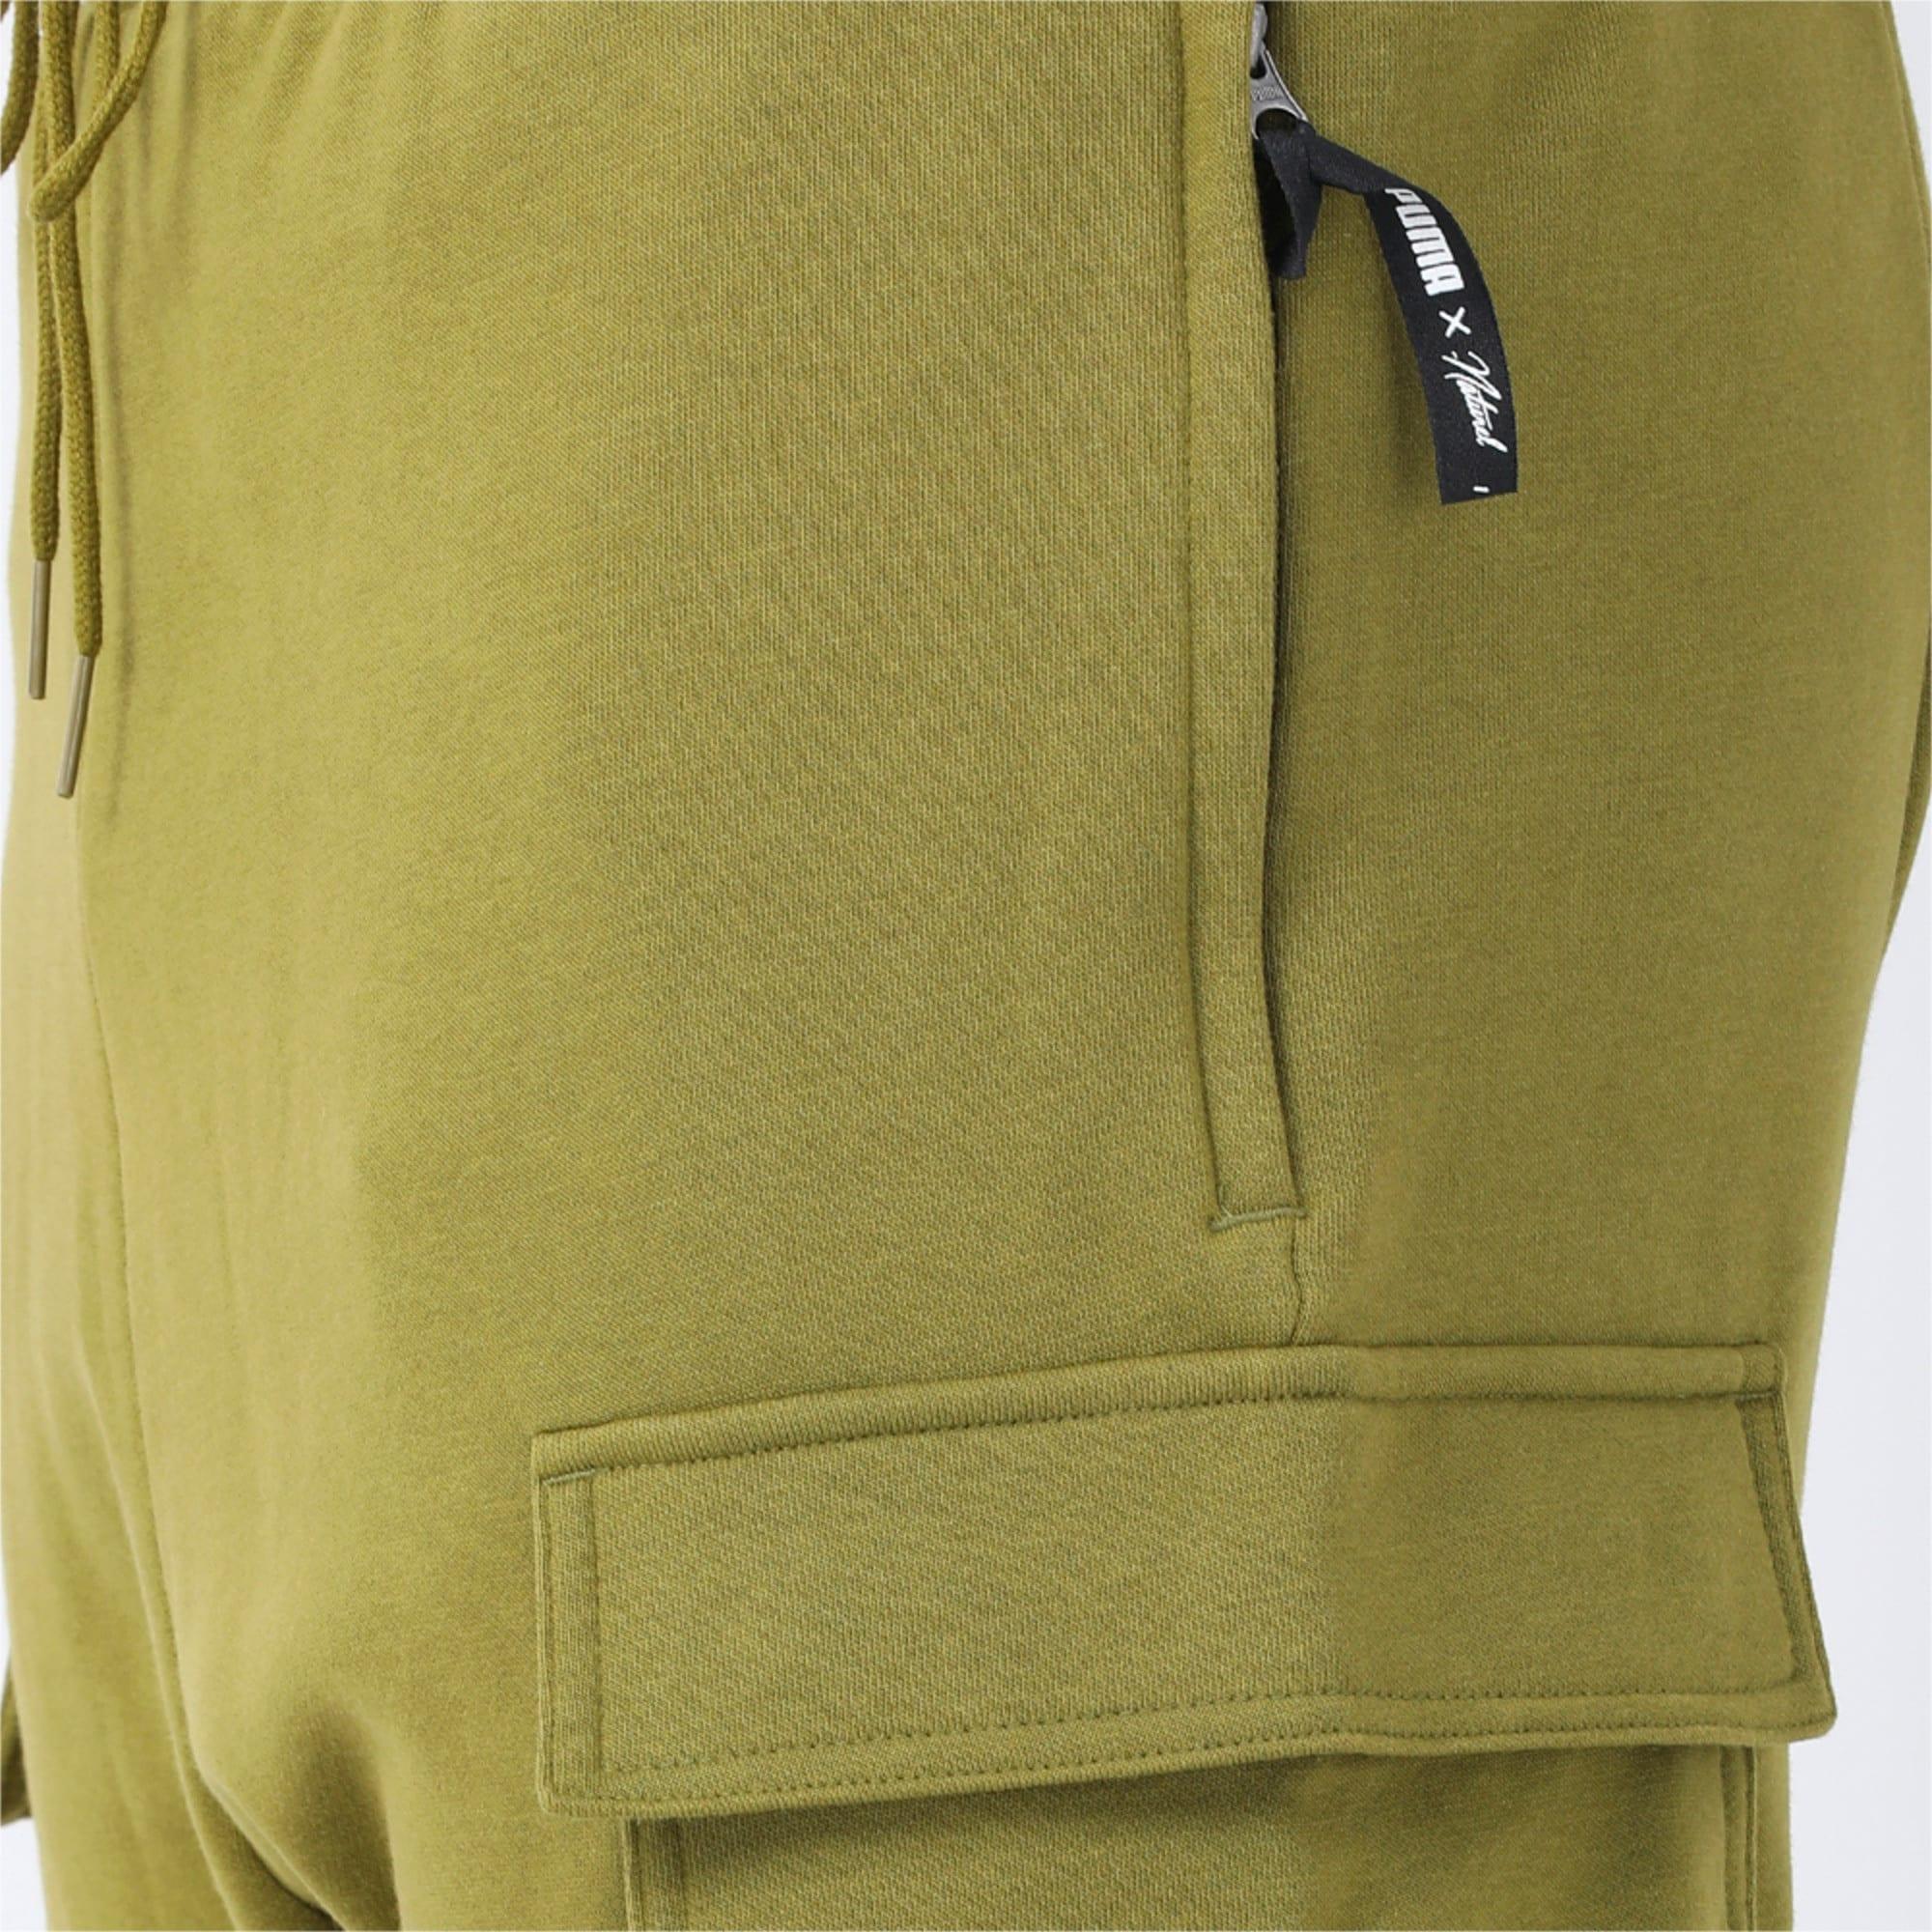 Thumbnail 3 of PUMA x NATUREL Men's Shorts, Avocado, medium-IND